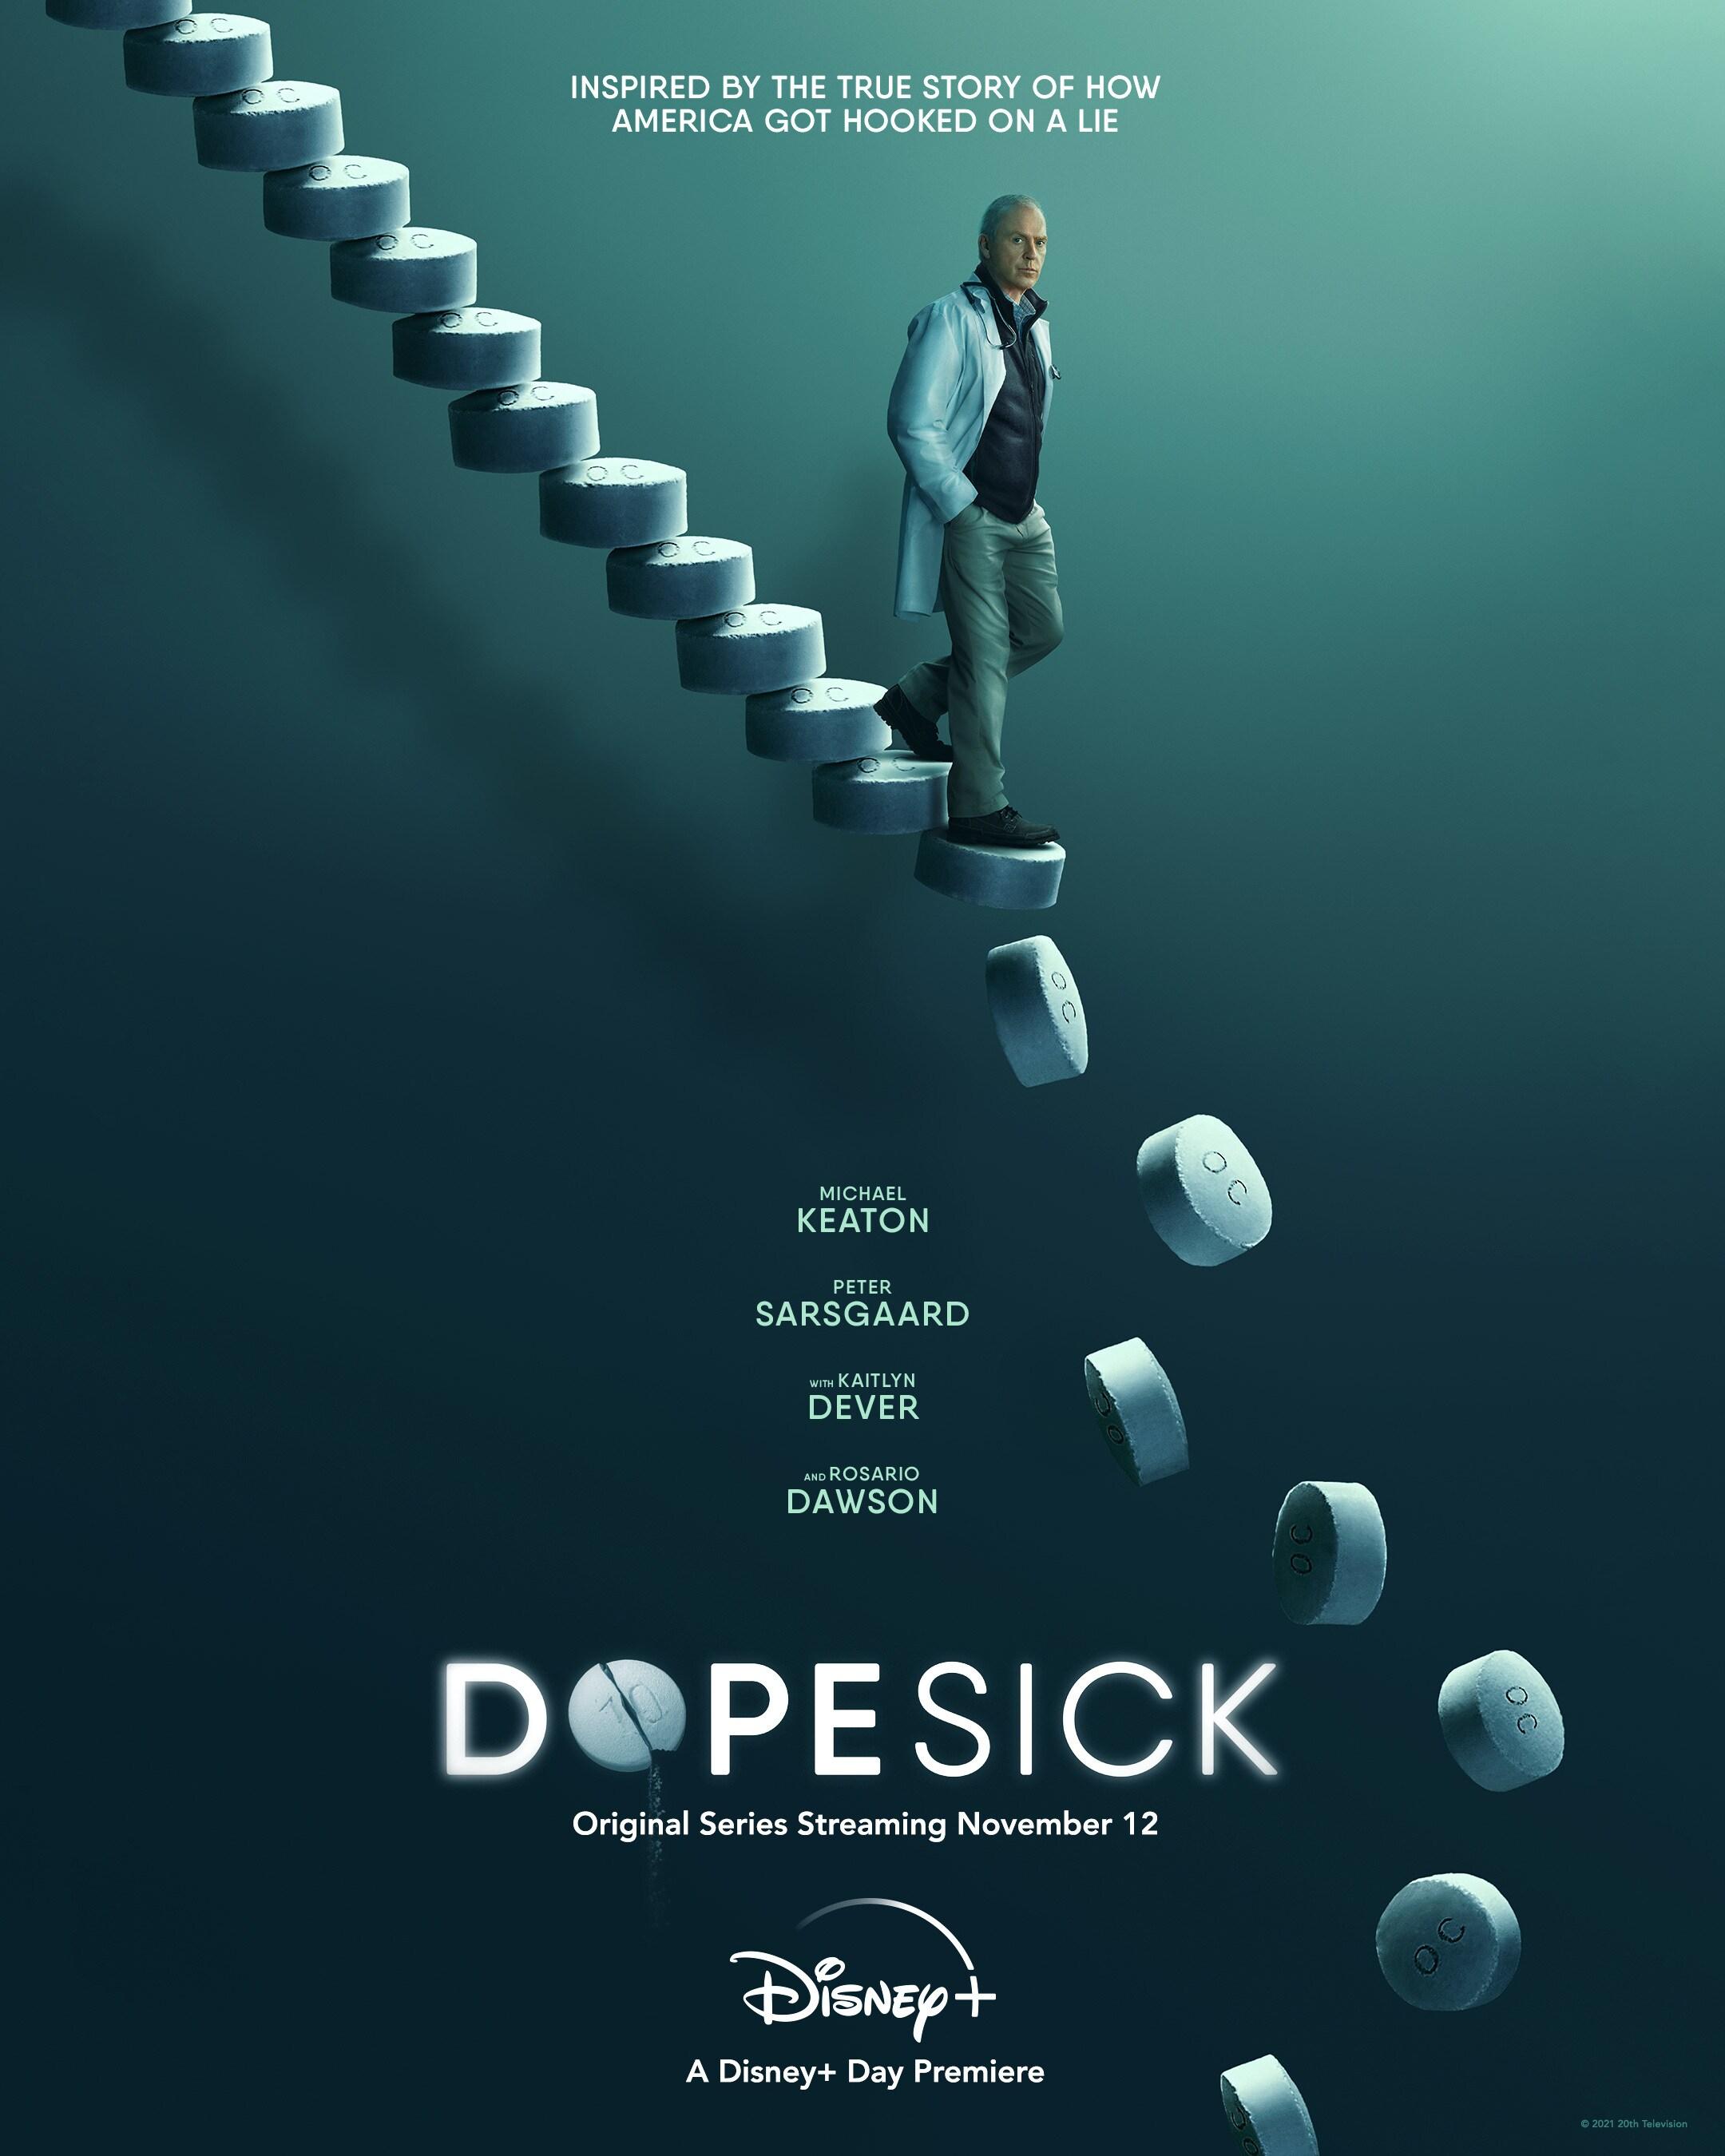 Dopesick Poster Image